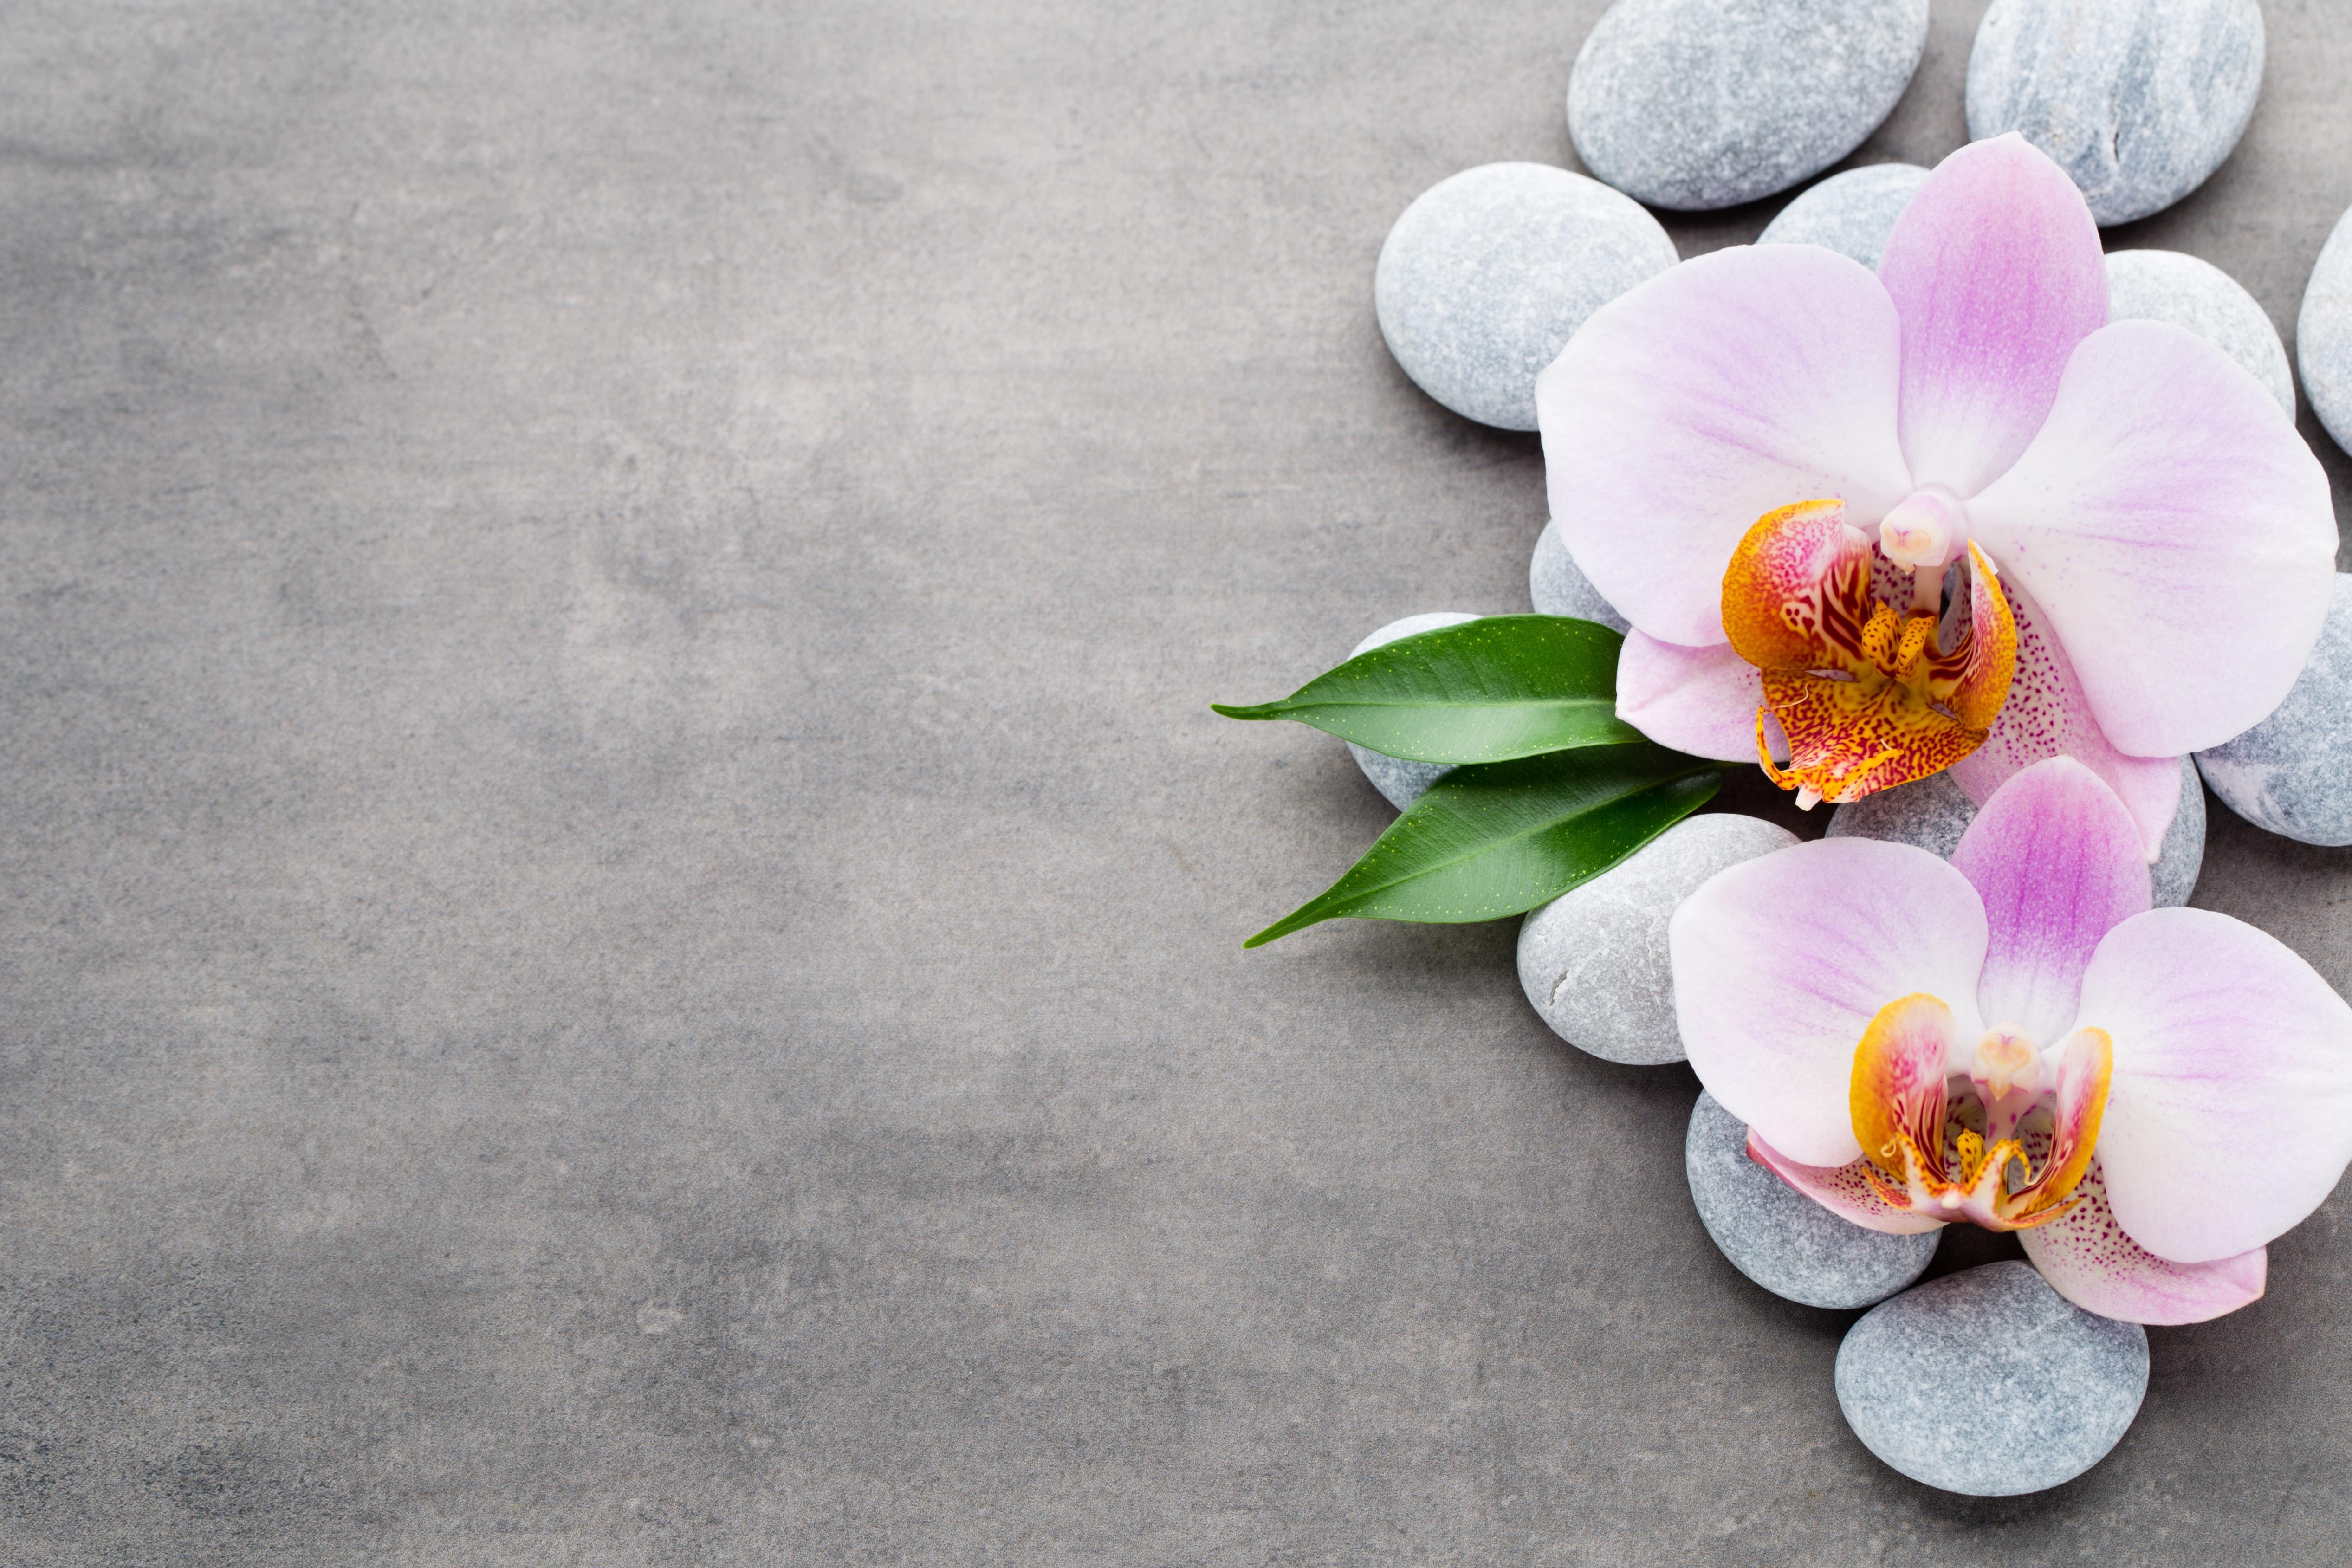 Картинки на рабочий стол орхидеи на камнях